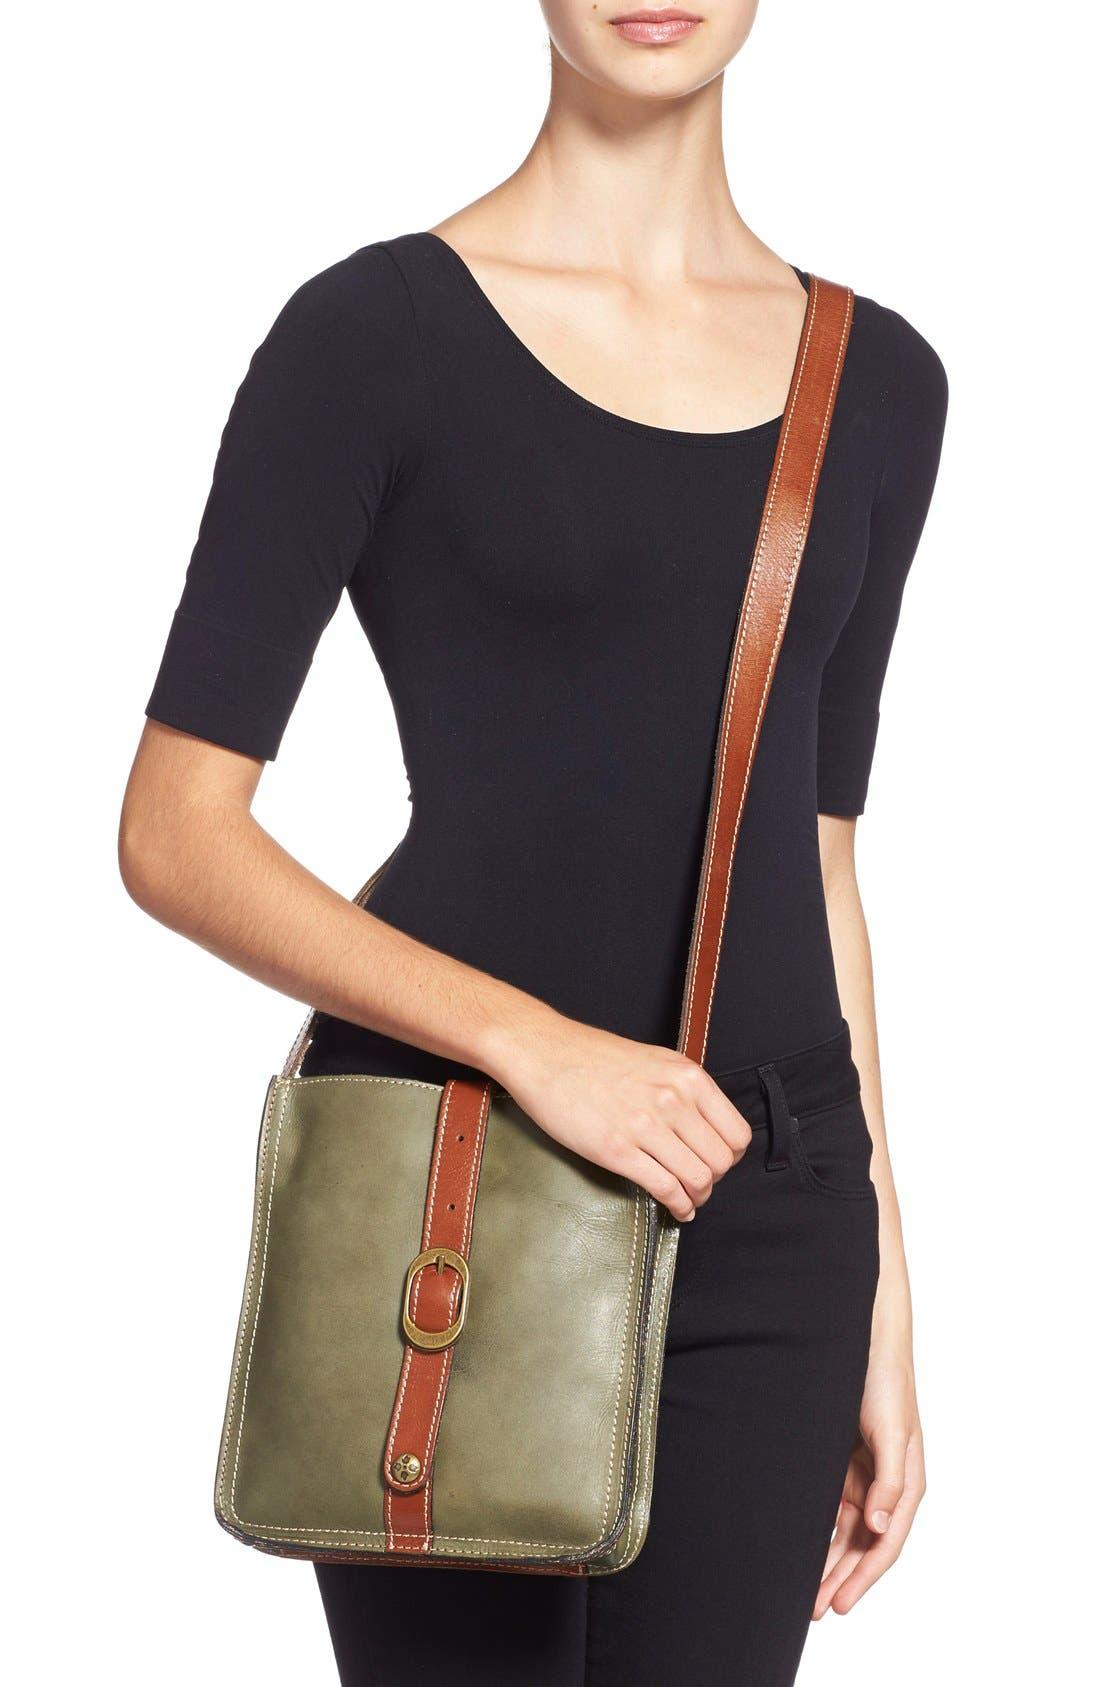 Alternate Image 2  - Patricia Nash 'Venezia' Leather Pouch